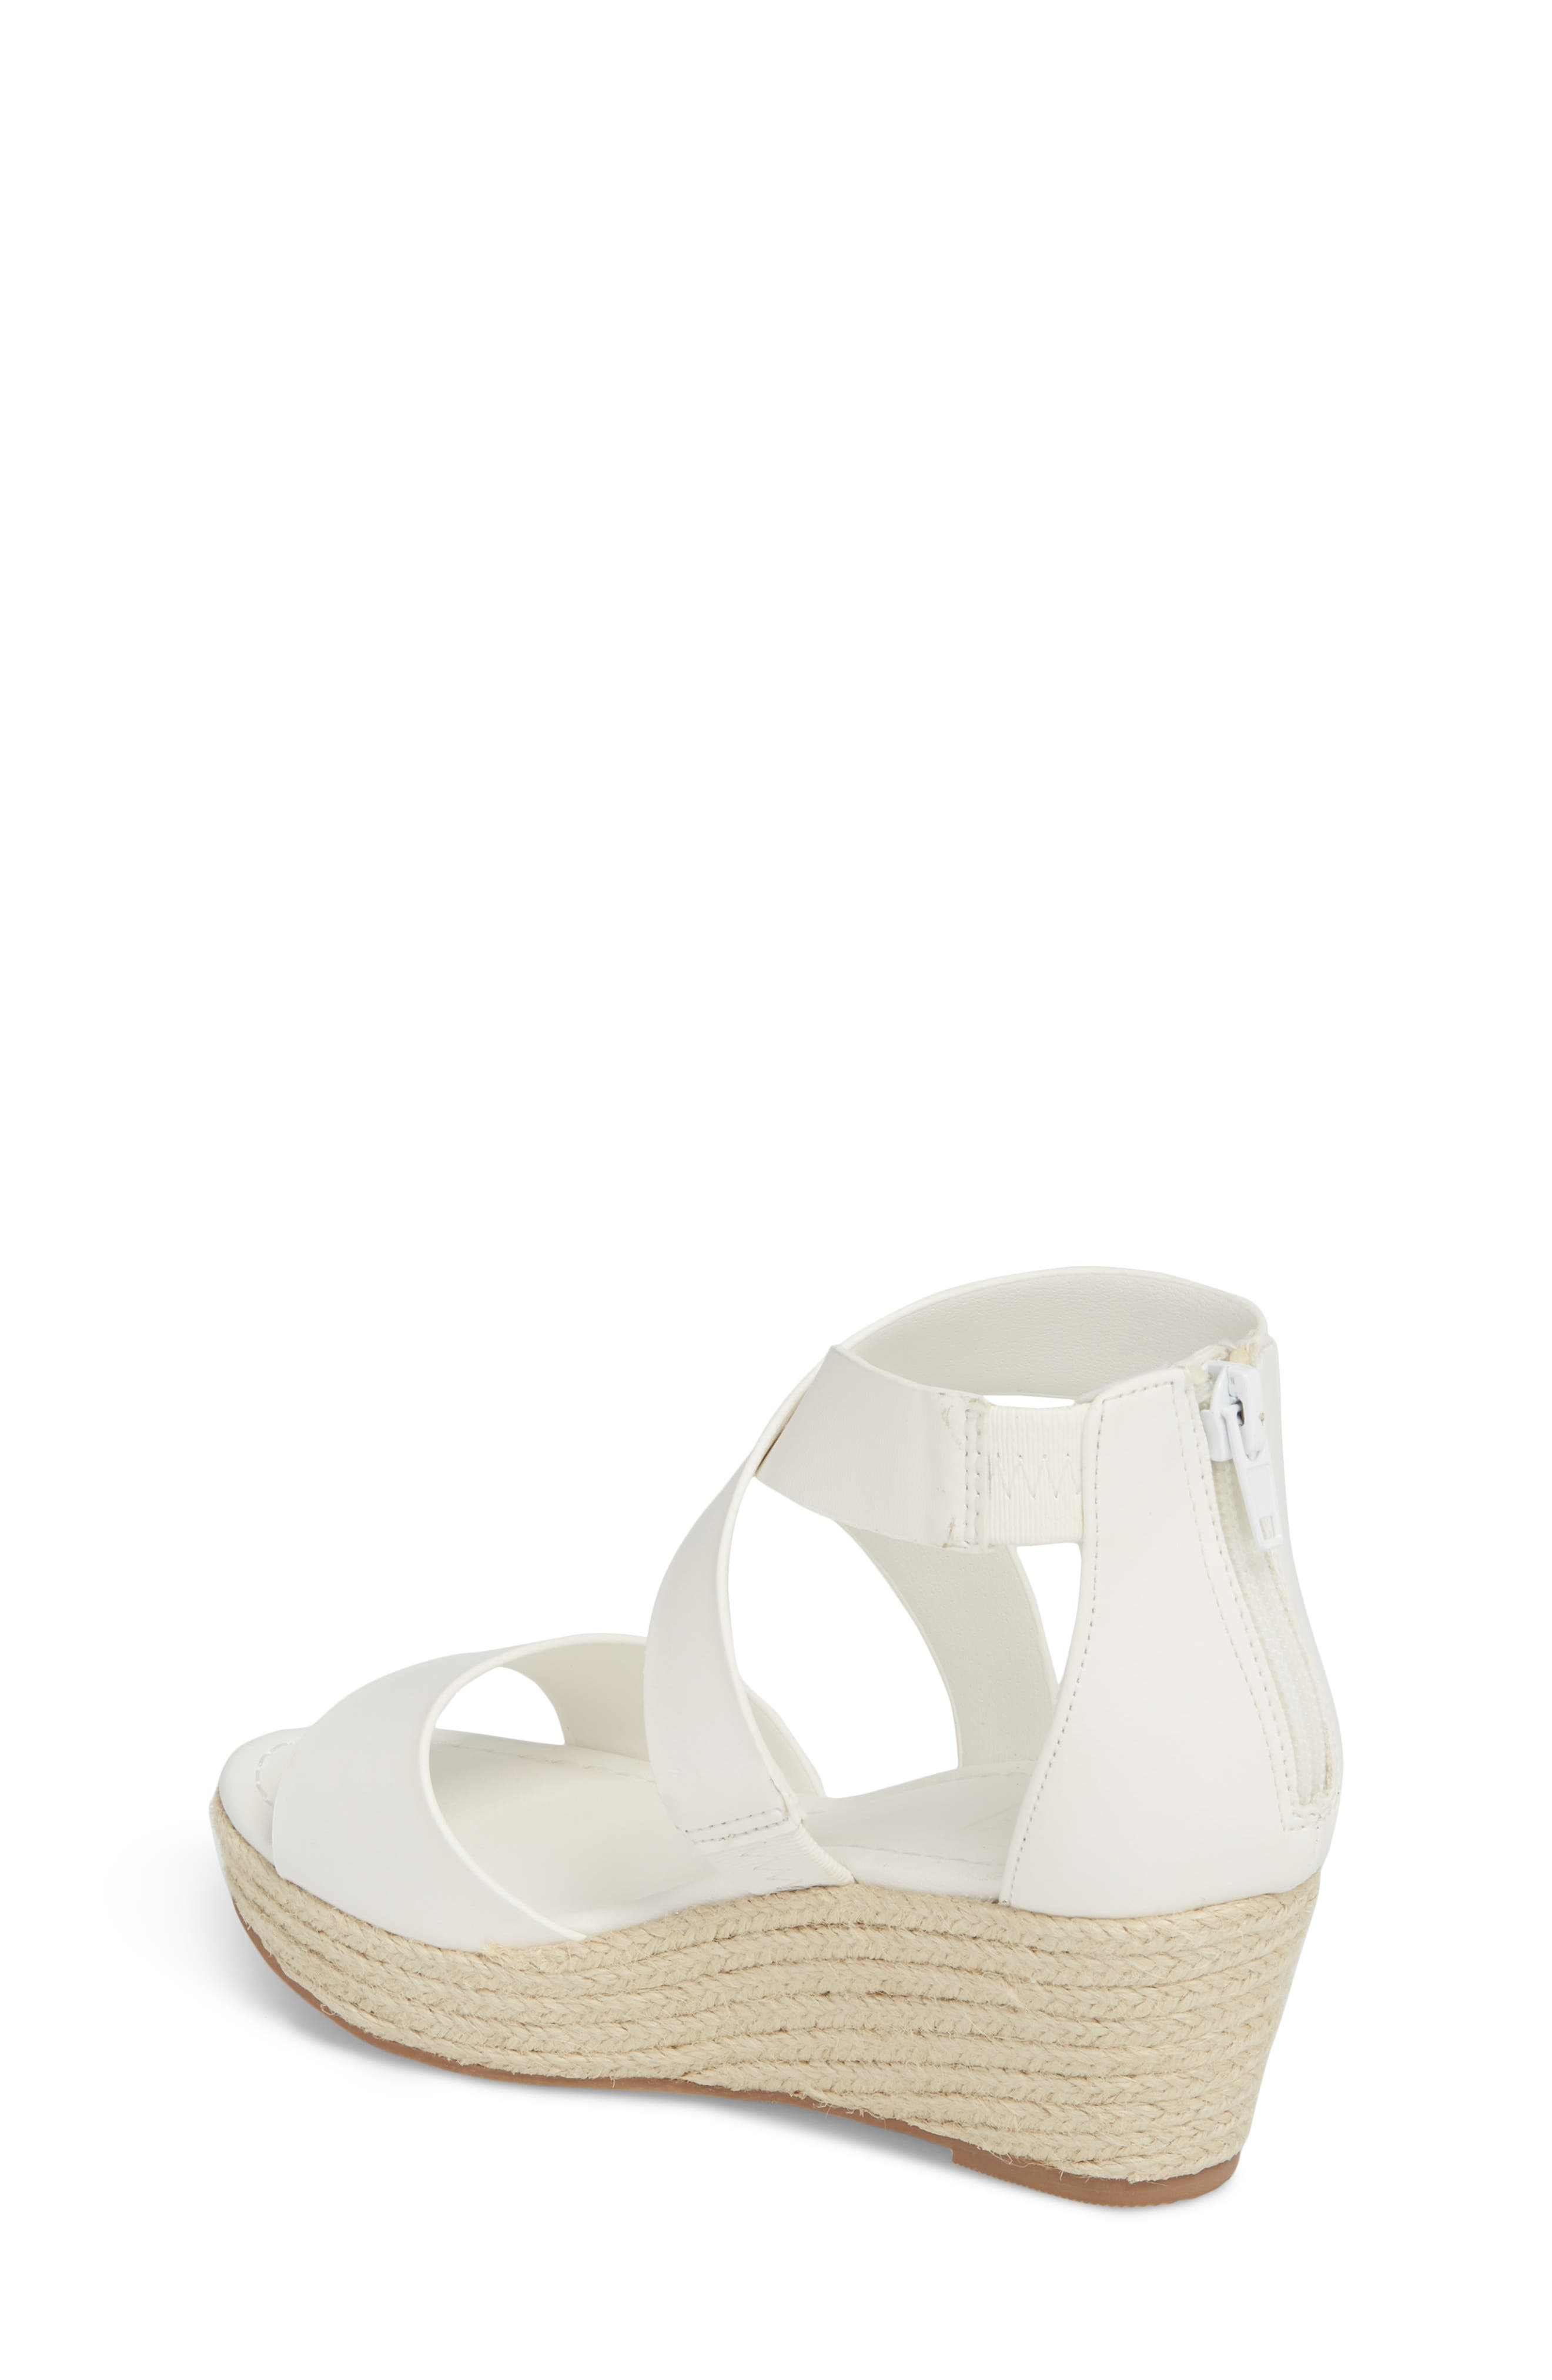 Wilma Platform Wedge Sandal,                             Alternate thumbnail 2, color,                             White